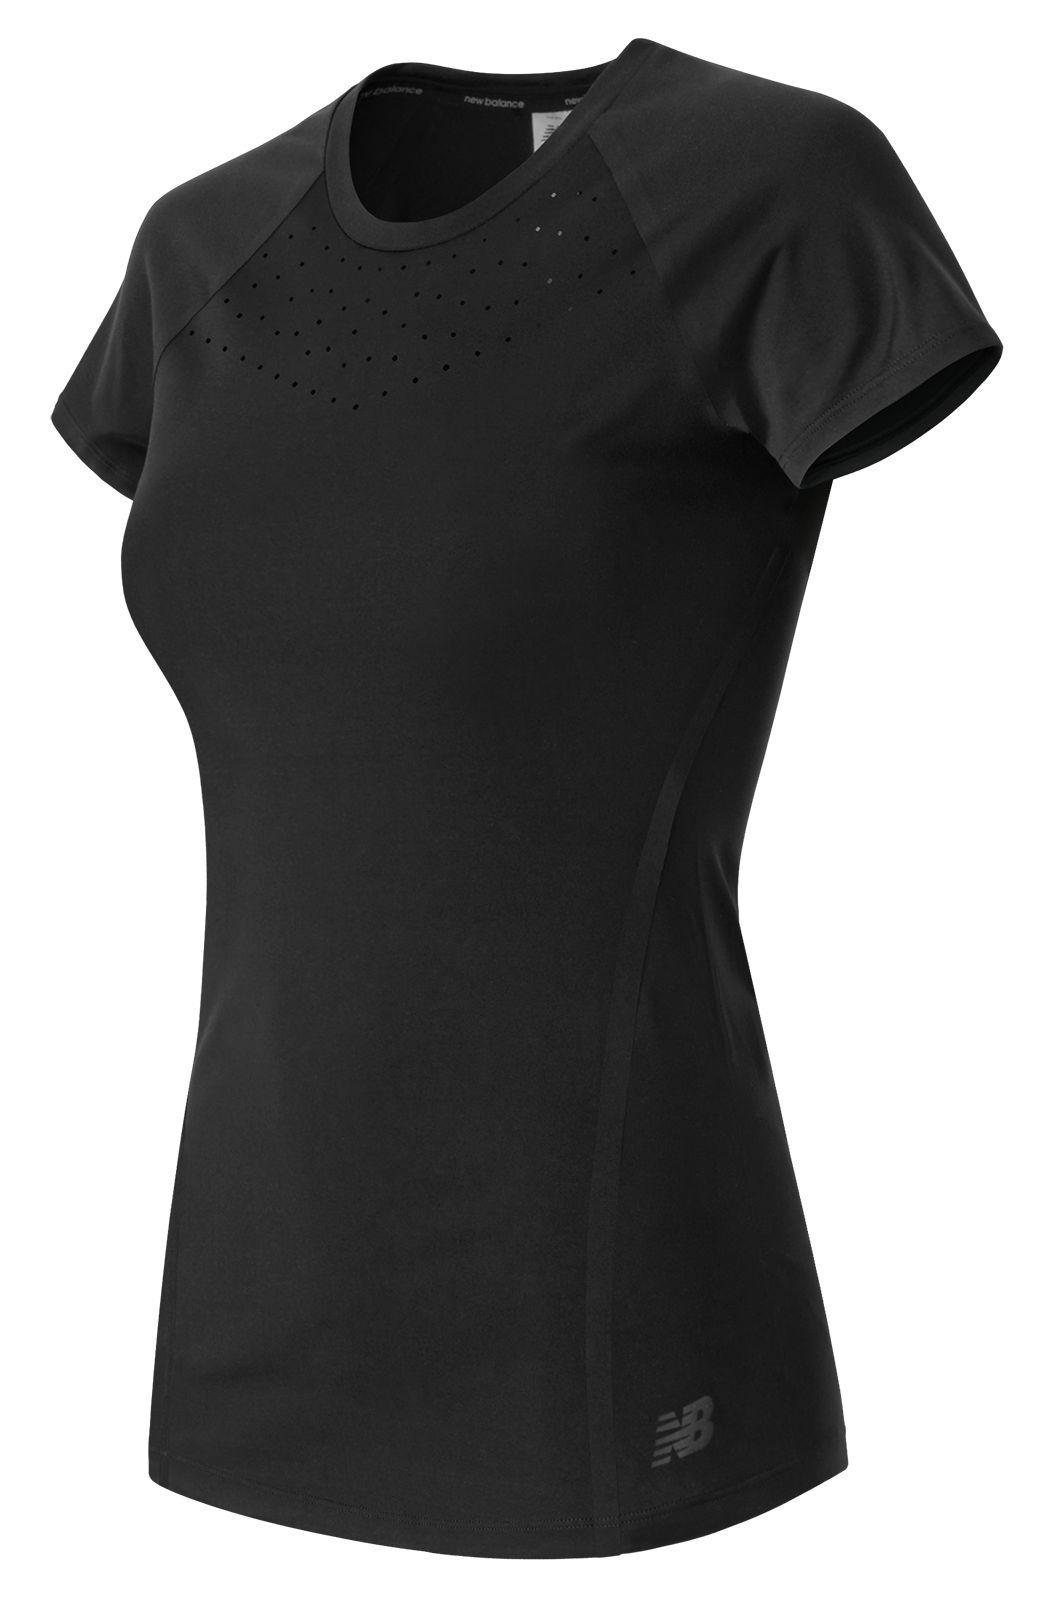 New Balance. Women's Black Trinamic Short Sleeve Top